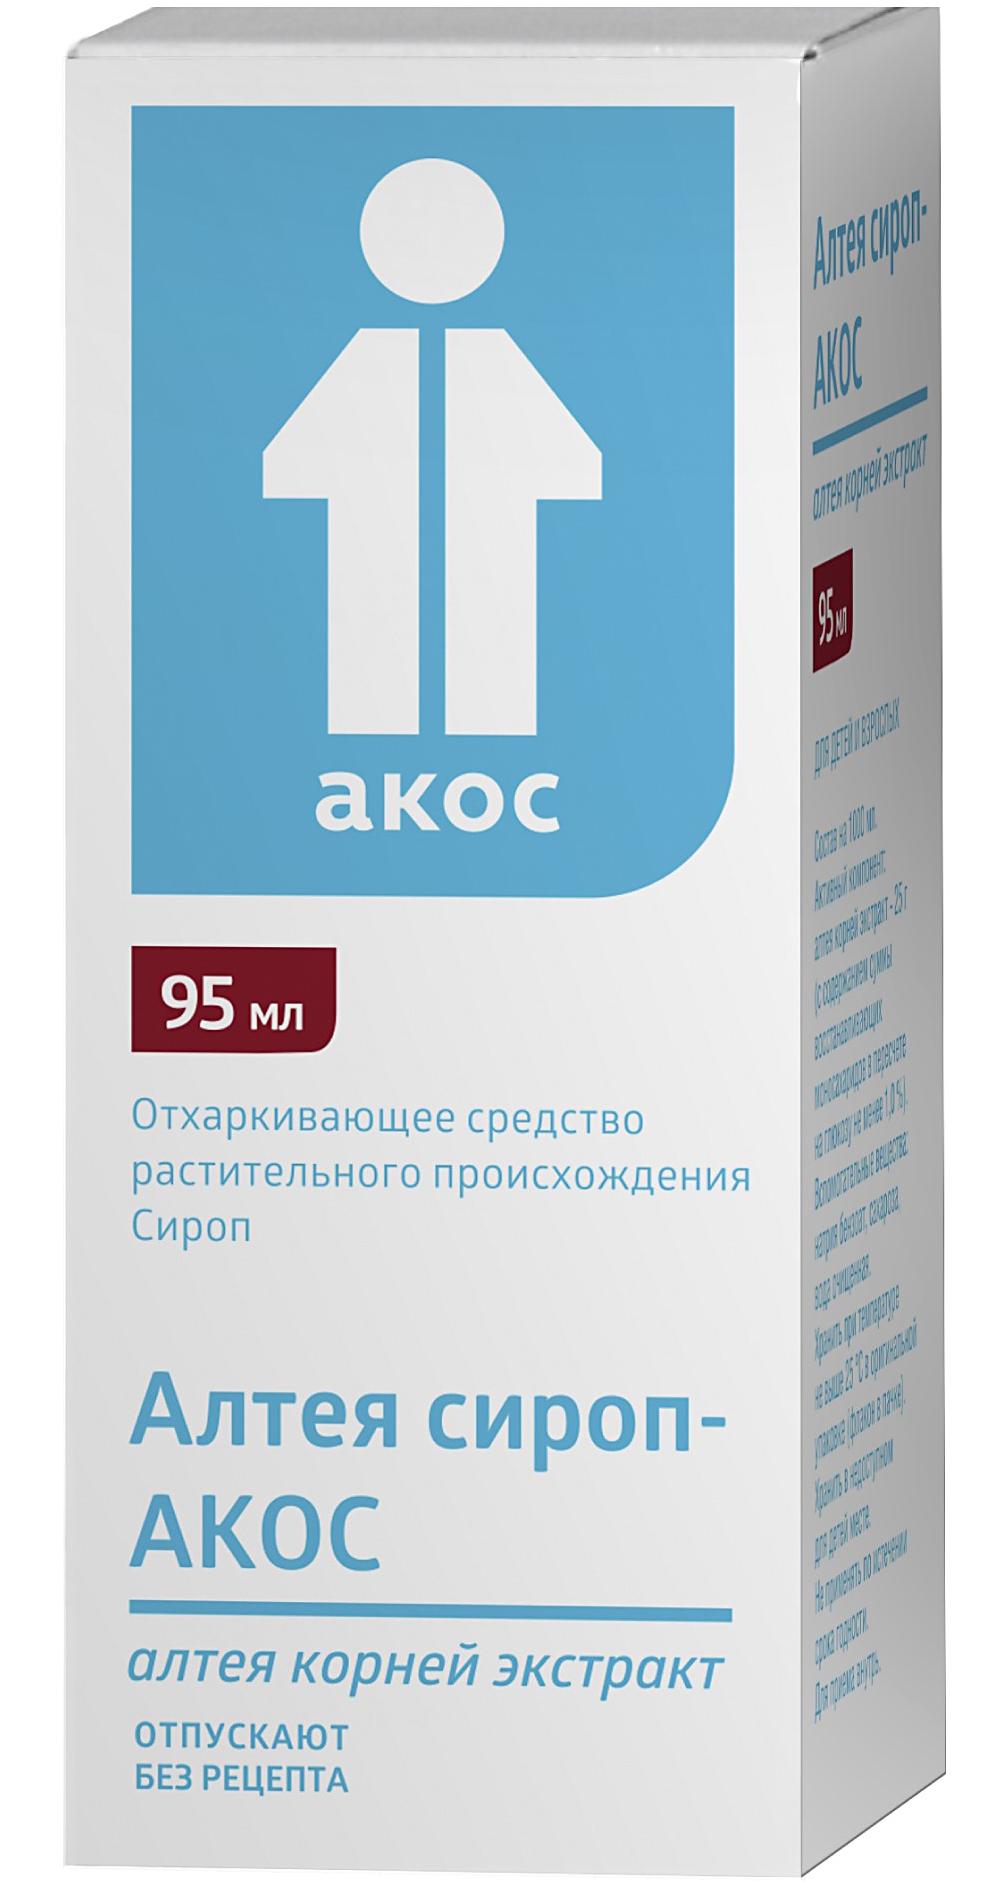 Алтея сироп-Акос фл 95мл